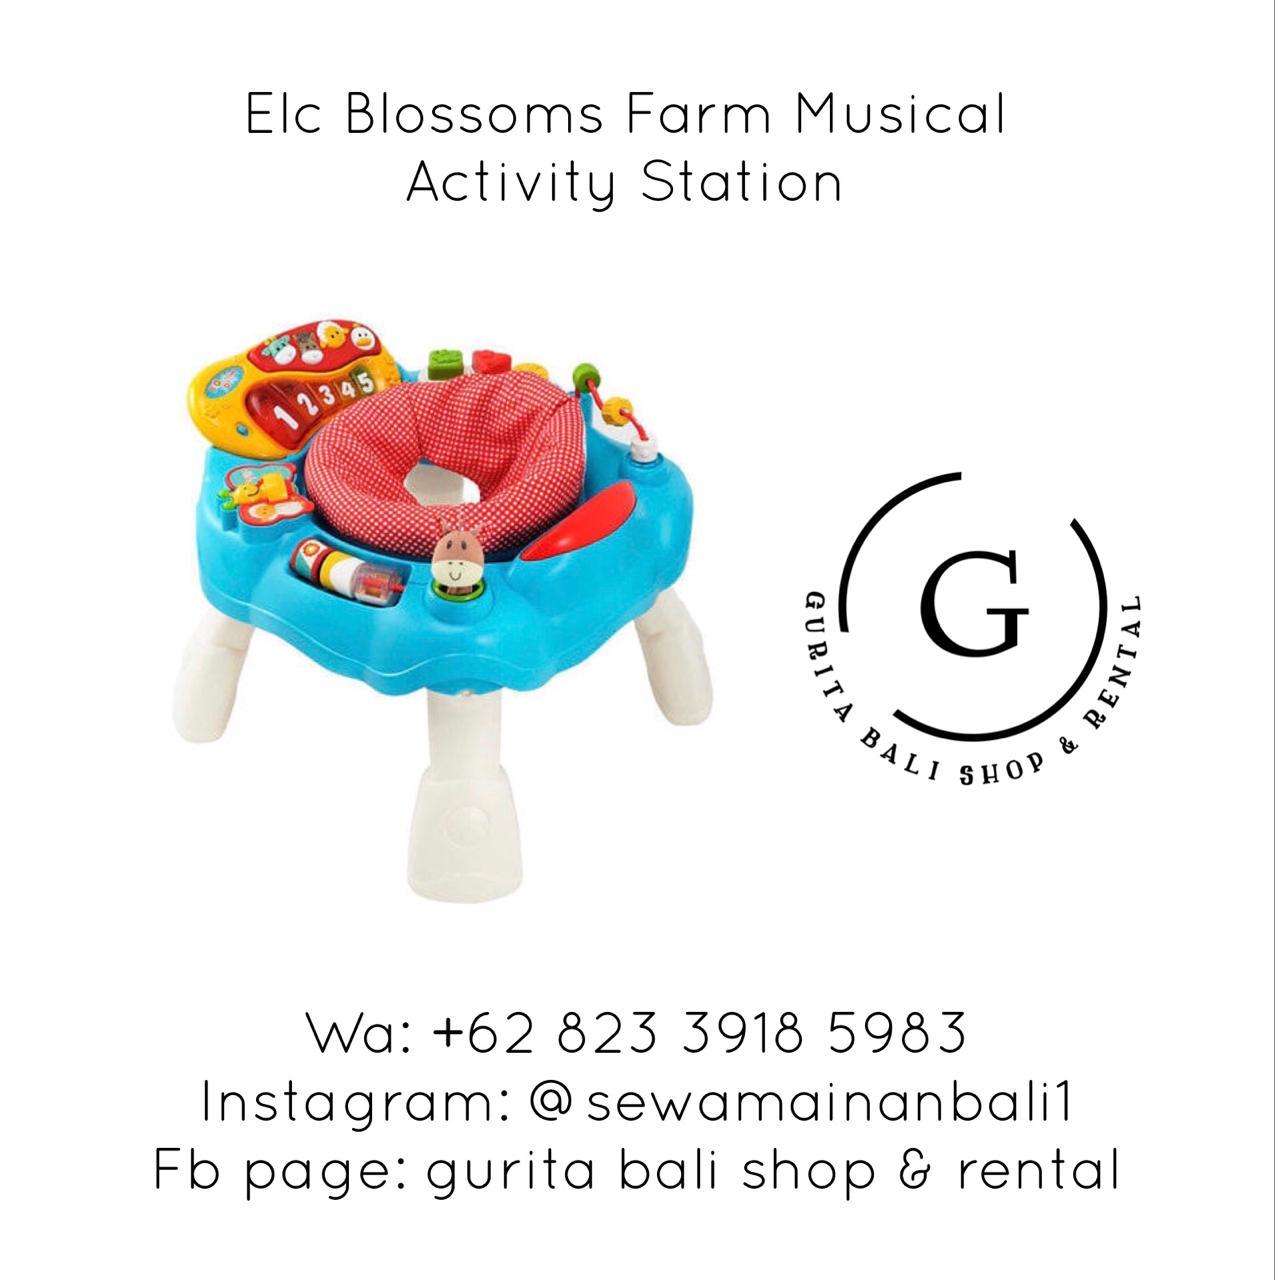 ELC BLOSSOM FARM MUSICAL ACTIVITY STATION